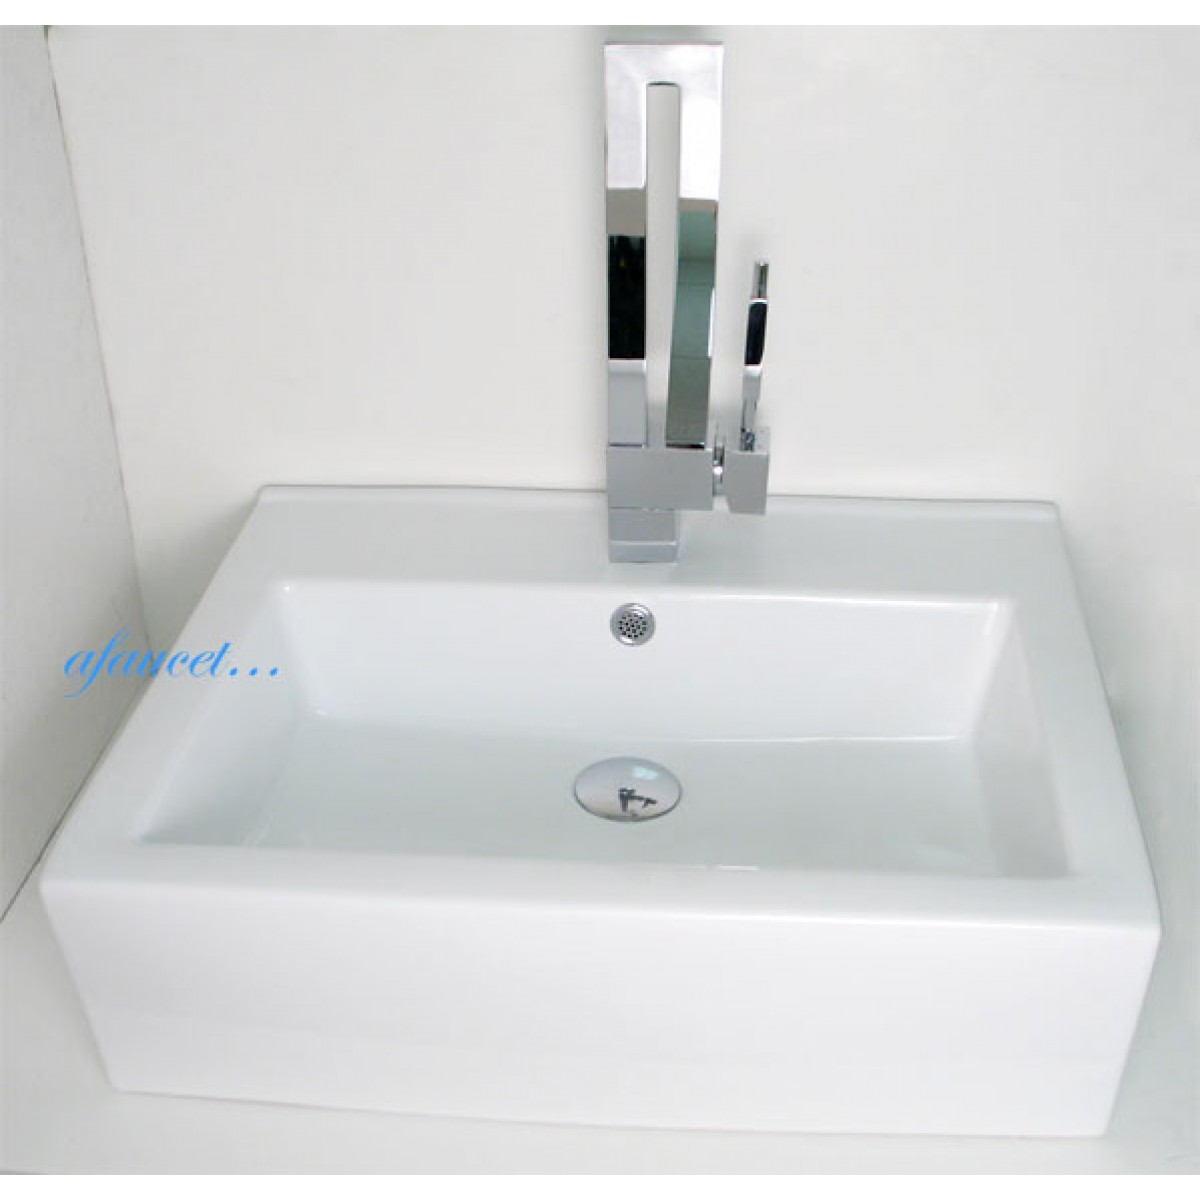 rectangular porcelain ceramic single hole countertop bathroom vessel sink x 17 x 6 inch